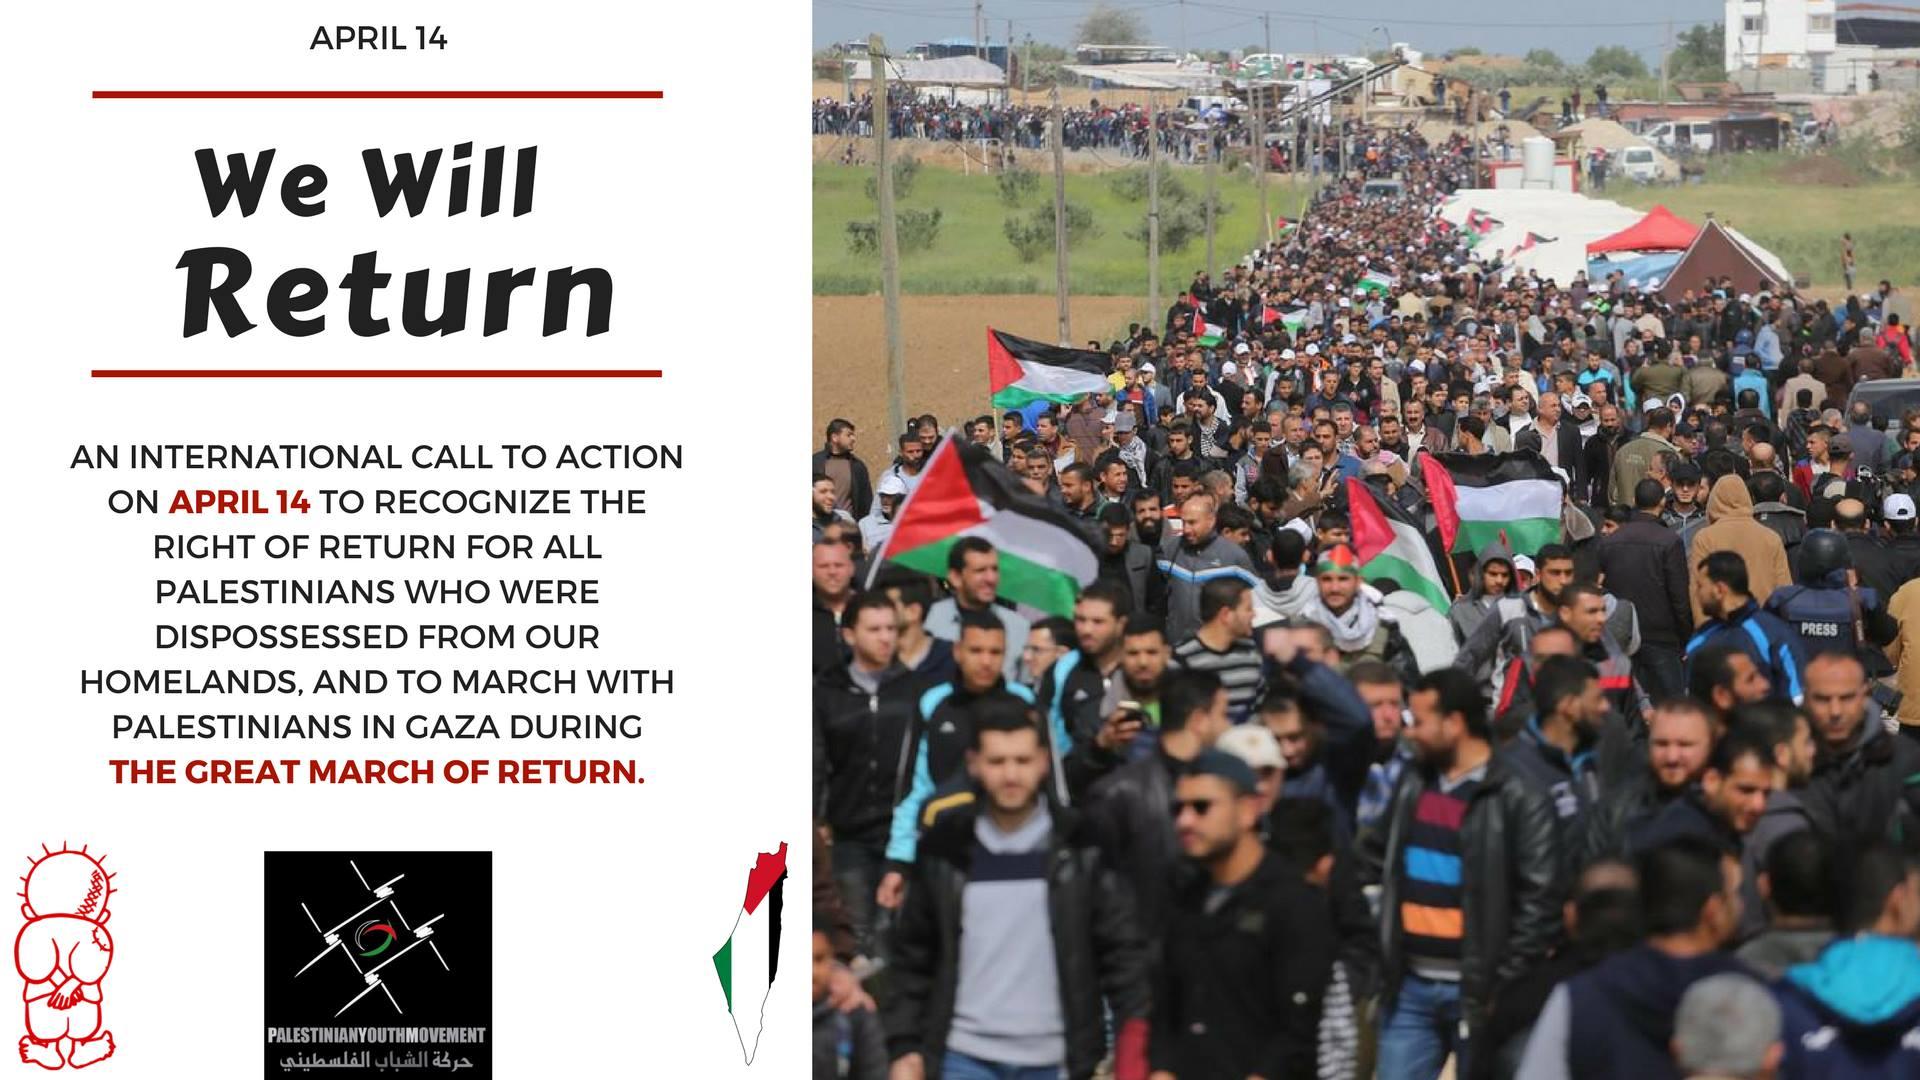 Great march return